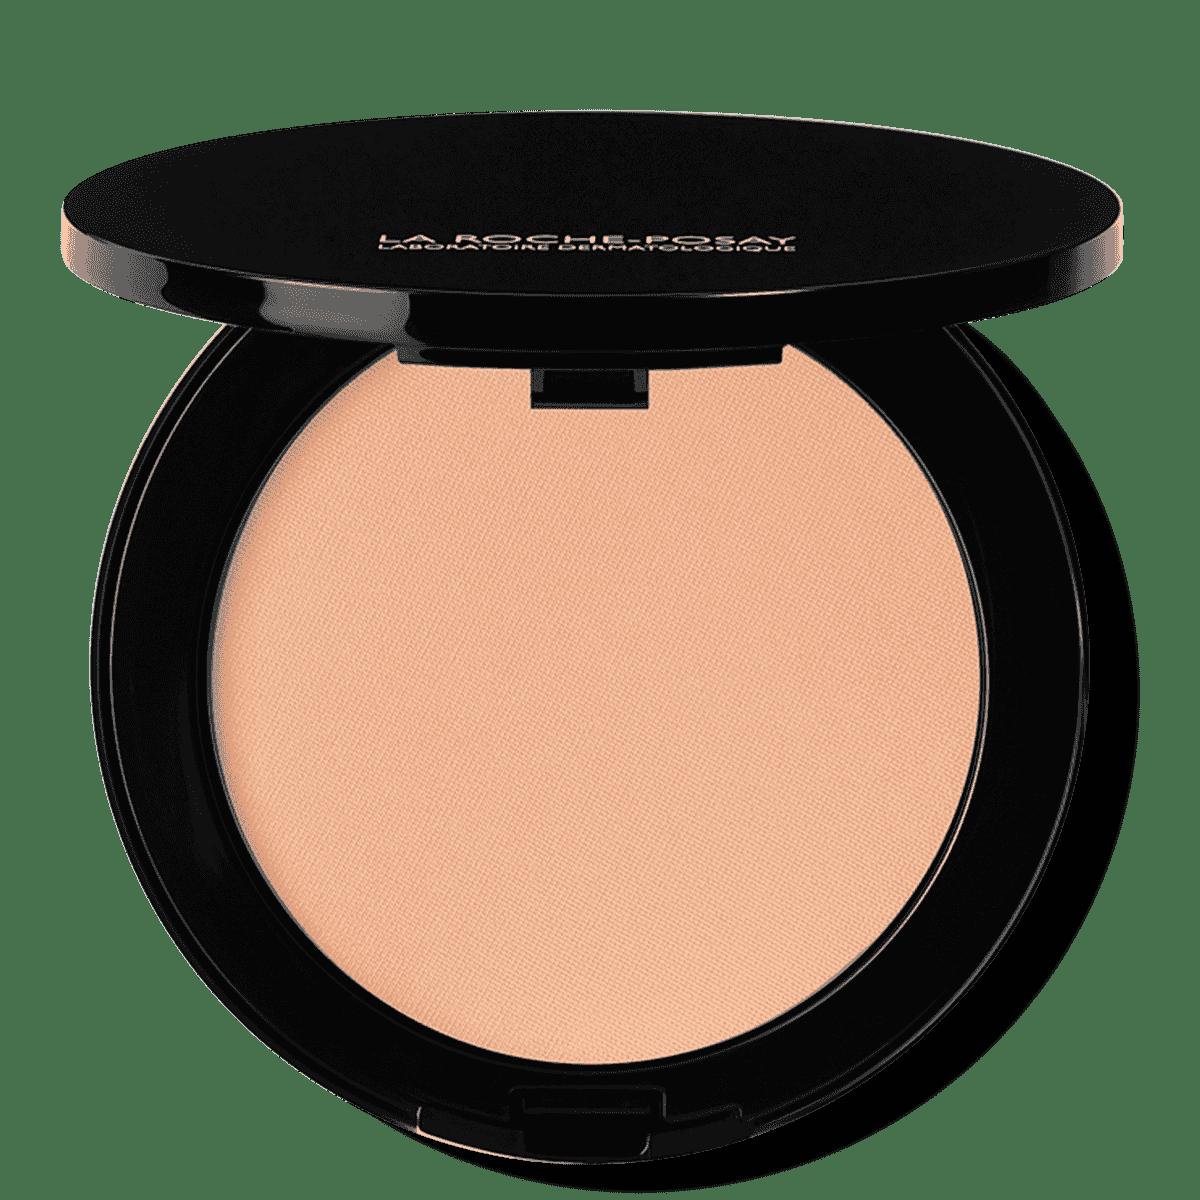 Toleriane Make up COMPACT POWDER 11 Light Beige Przód otwarte | La Roche Posay